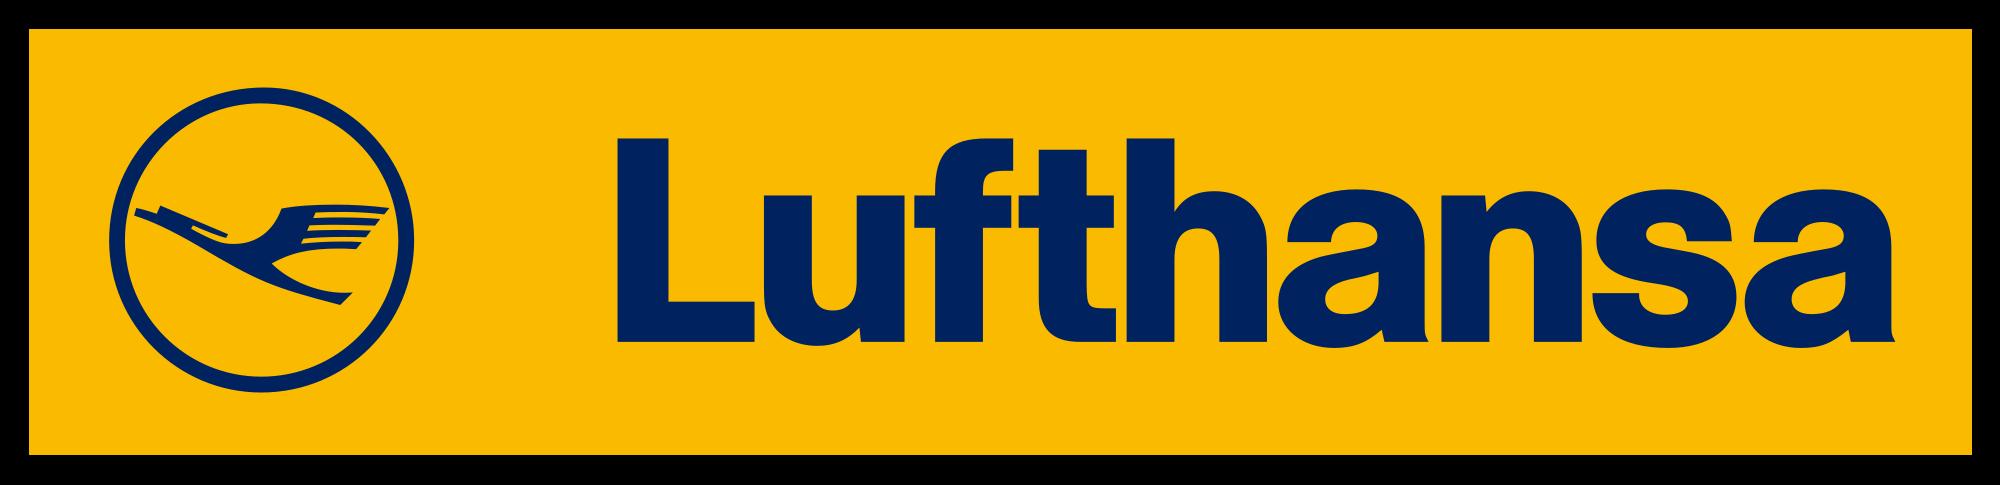 B_Lufthansa-Logo